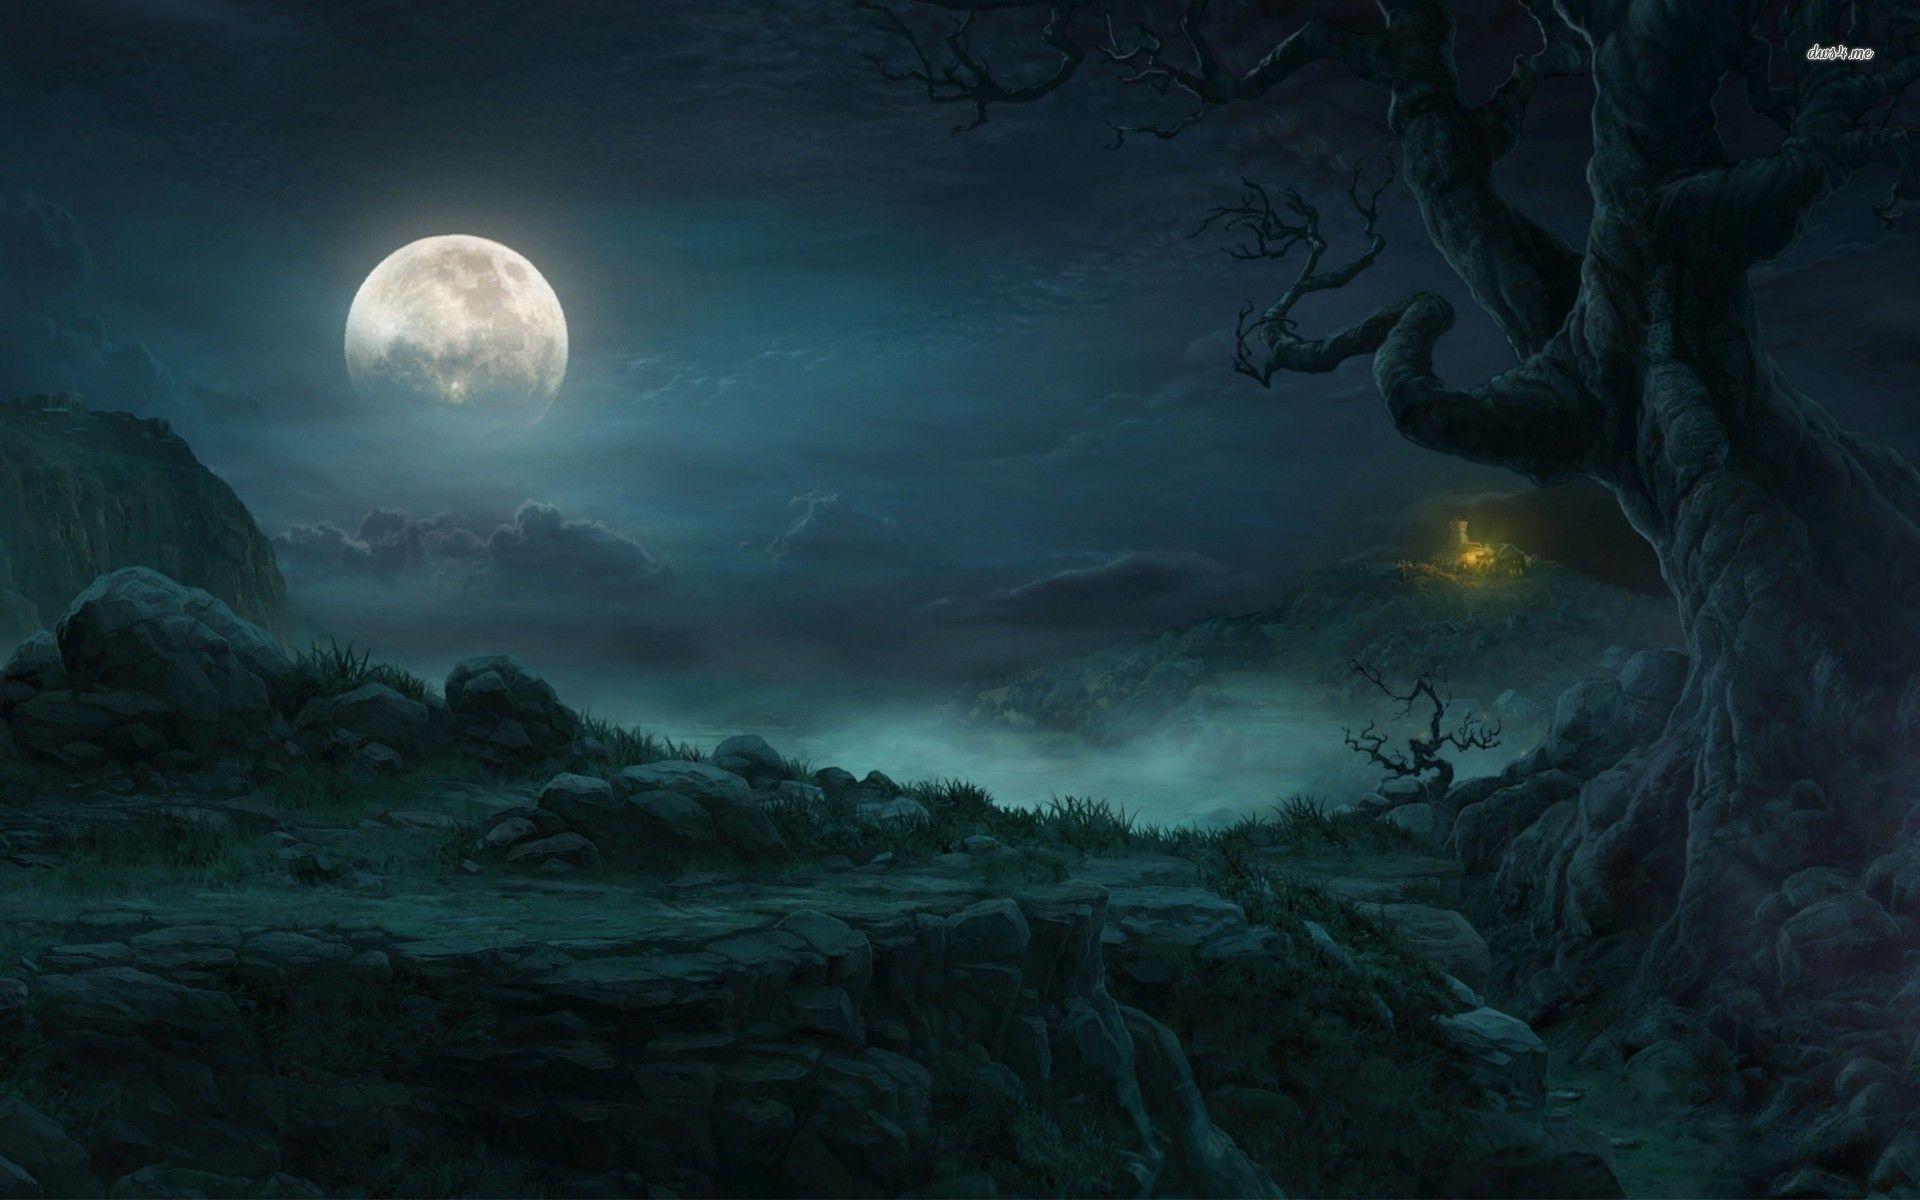 Pin By Vera Afanaseva On Moon Moon Artwork Forest Moon Fantasy Landscape